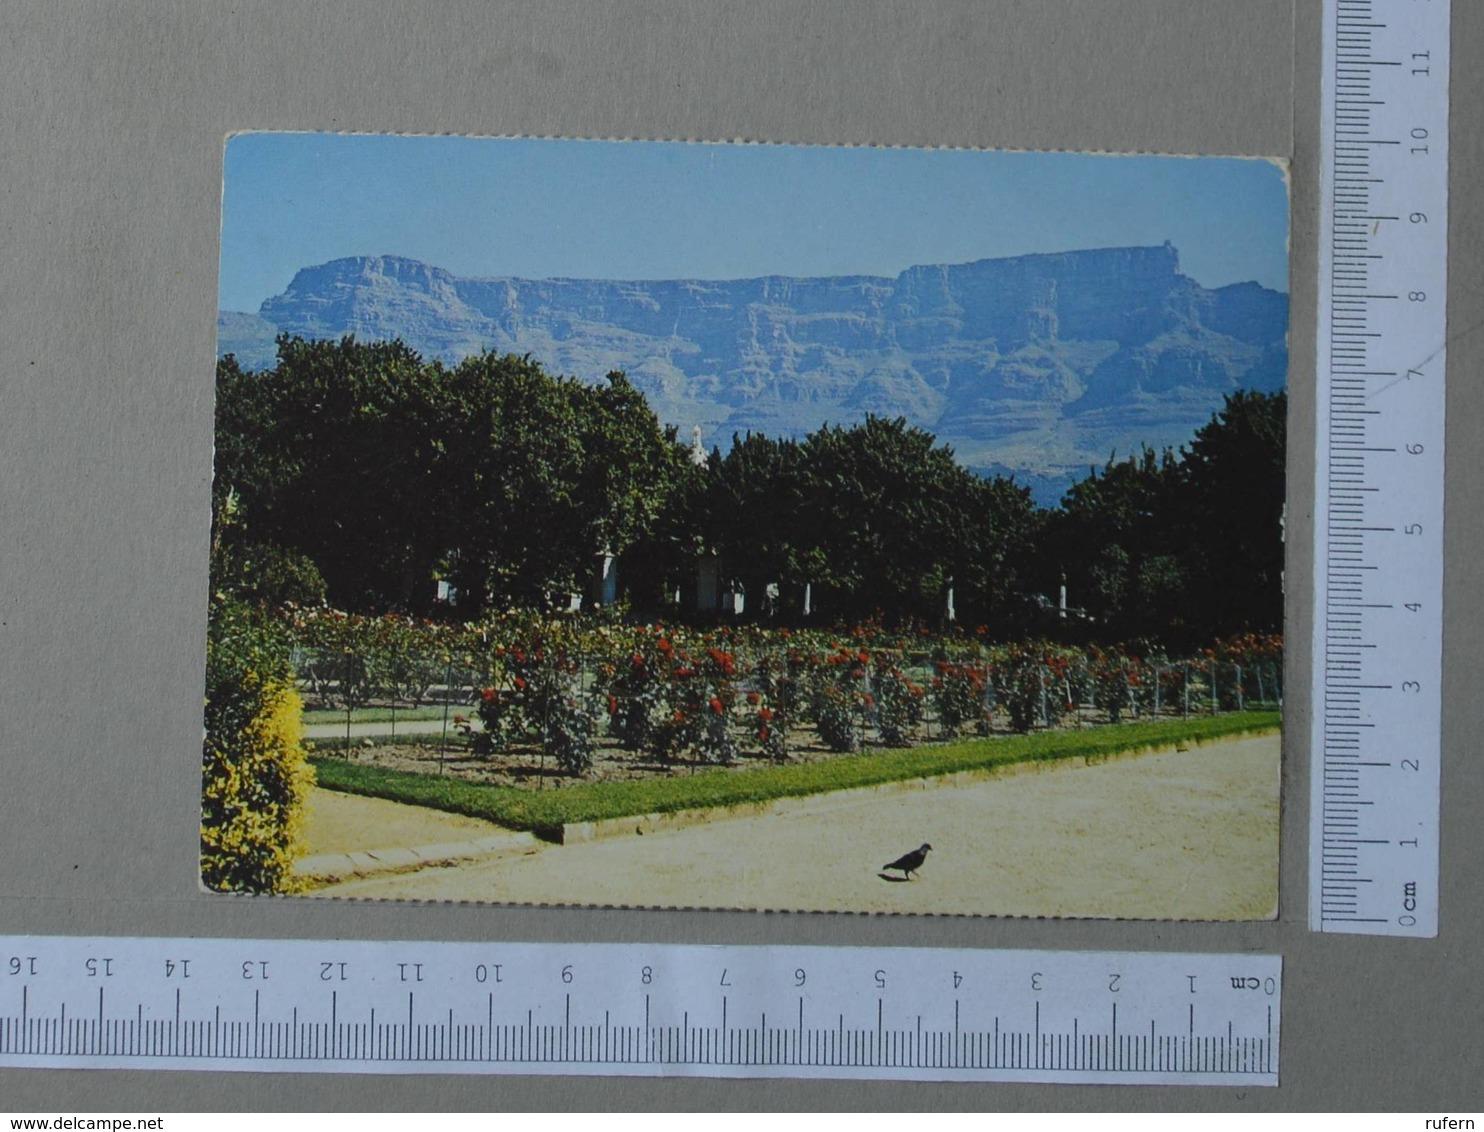 SOUHT AFRICA - BOTANICAL GARDENS -  CAPE TOWN -   2 SCANS  - (Nº25961) - Malawi